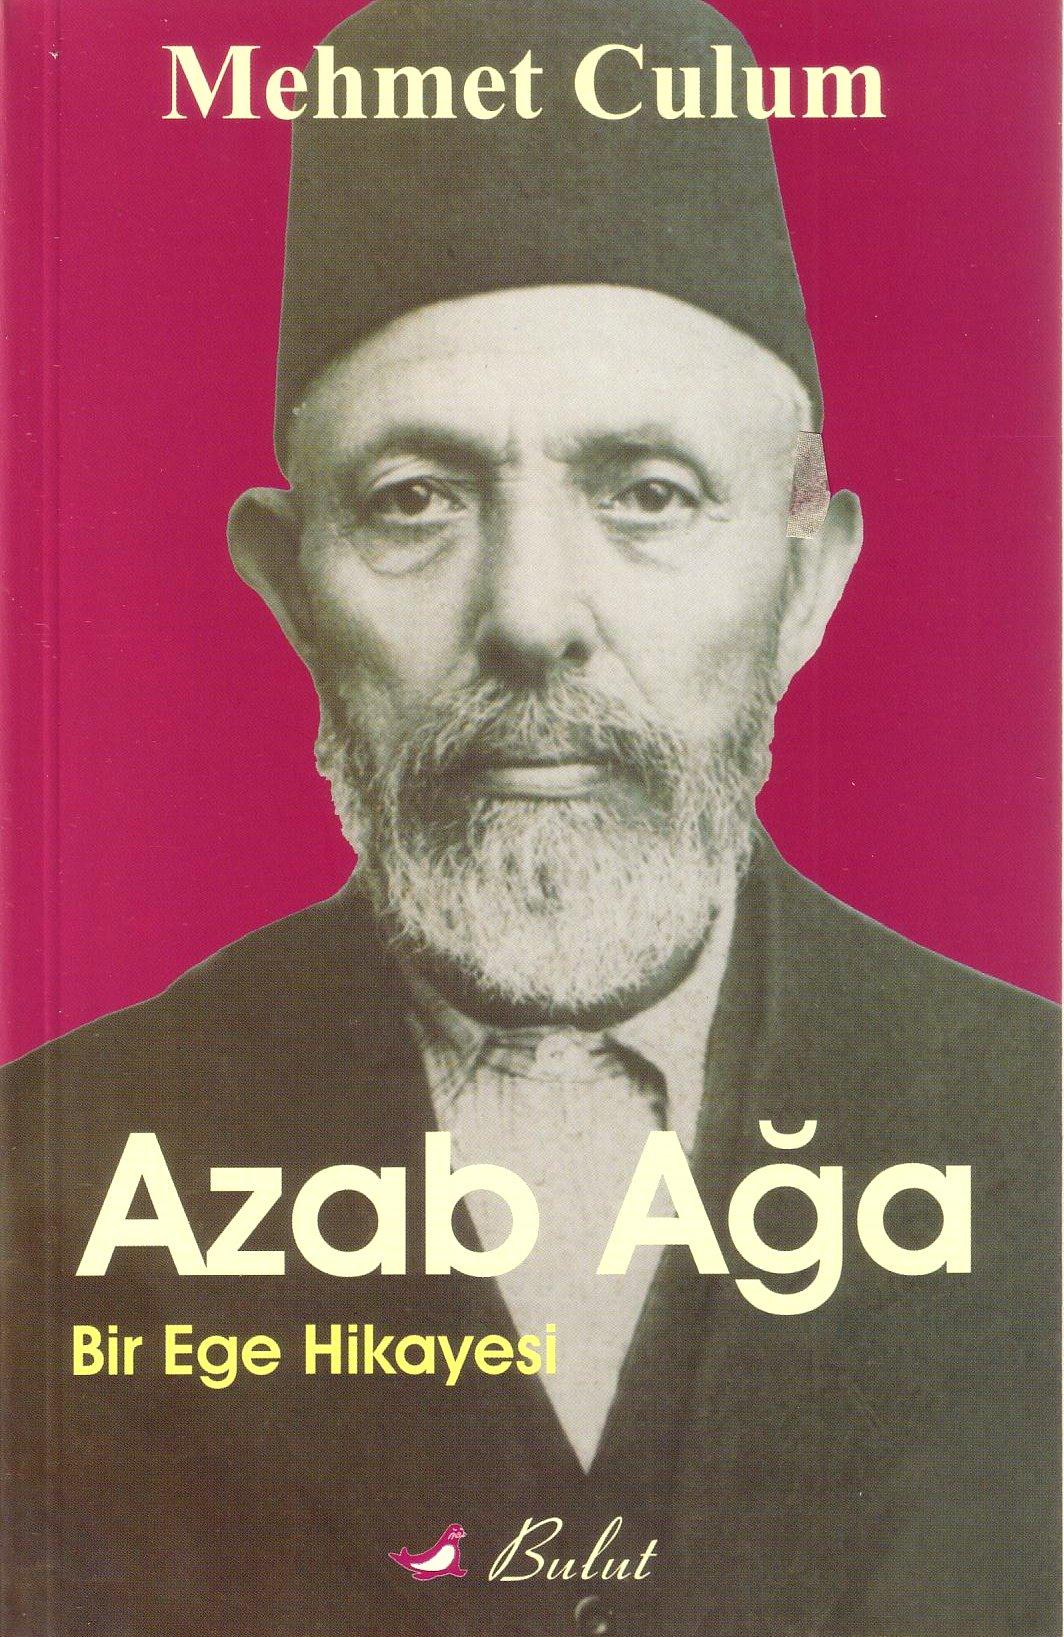 Azab Aga